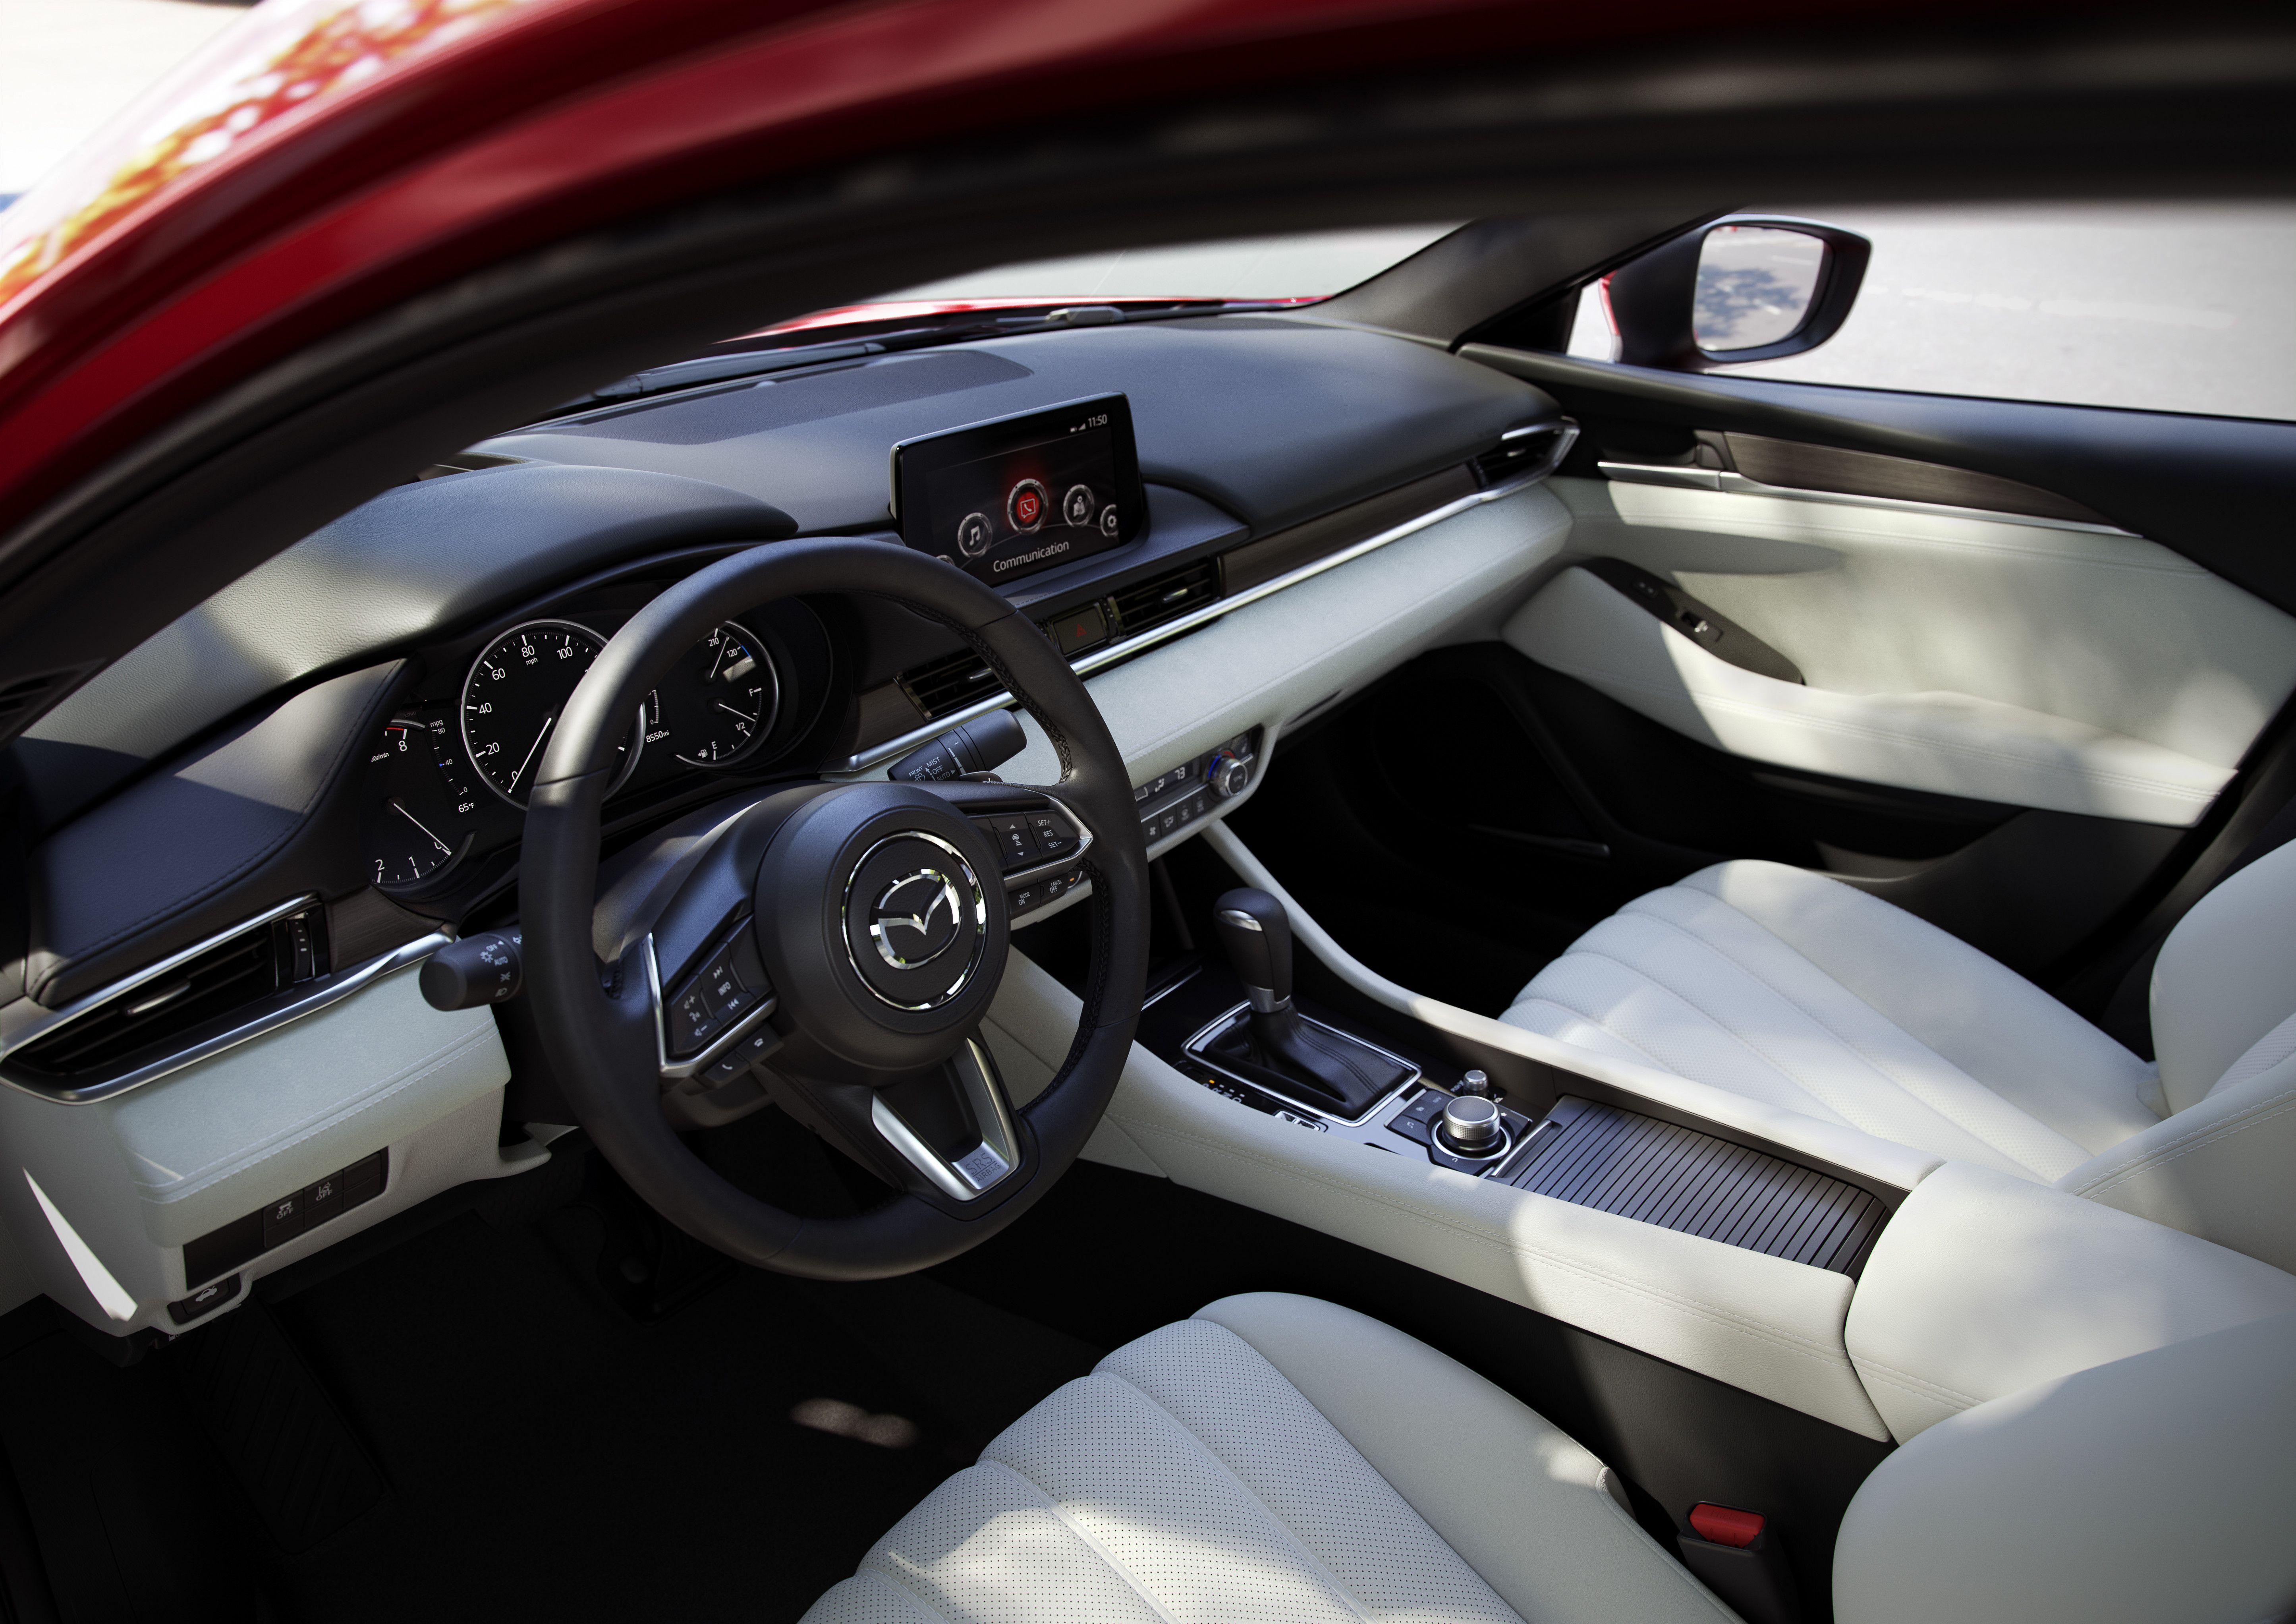 2020 Mazda Interior Colors Overview 2020 Car Reviews Mazda Mazda 6 Head Up Display